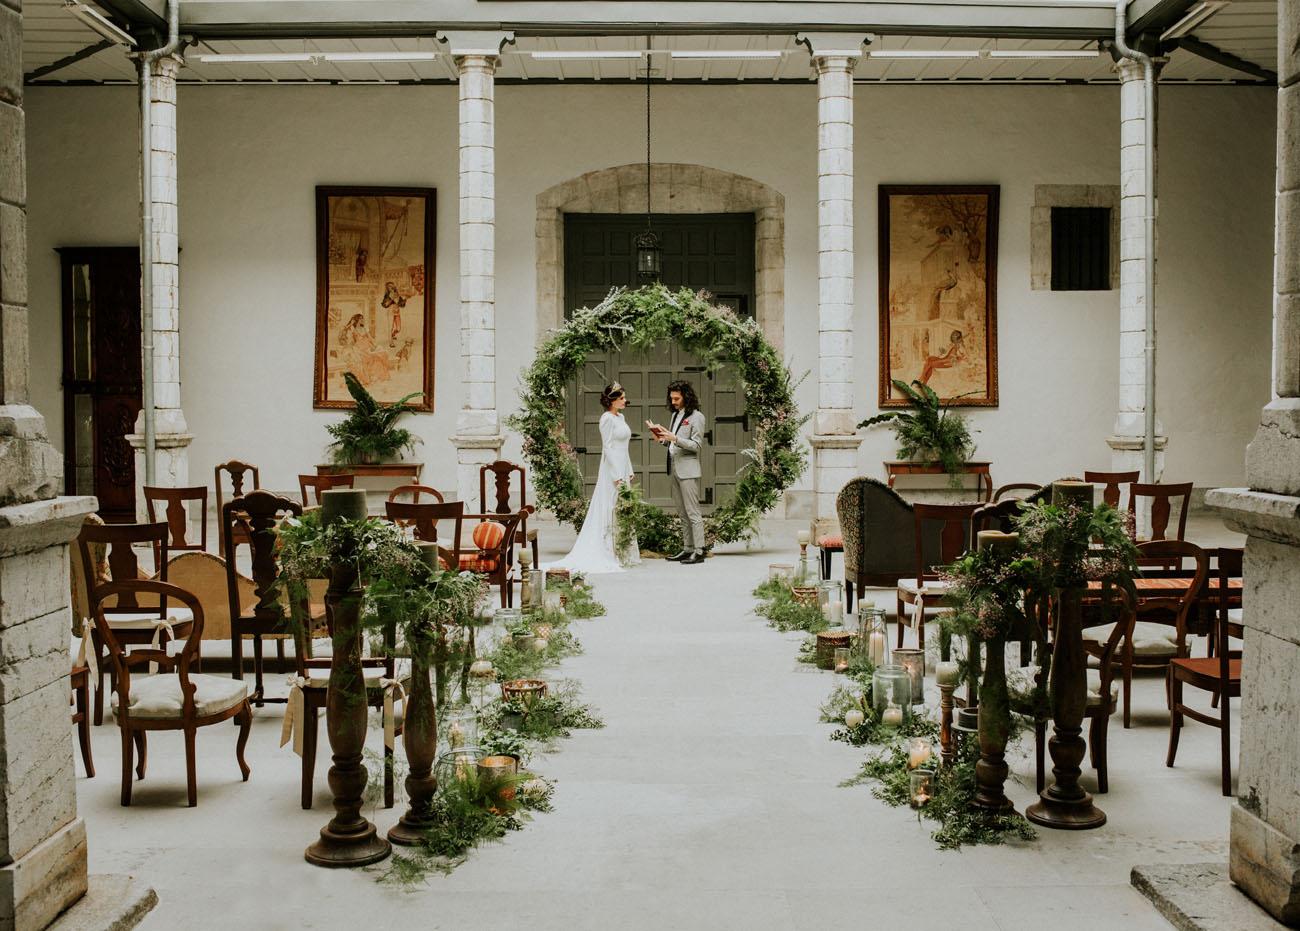 greenery wreath backdrop